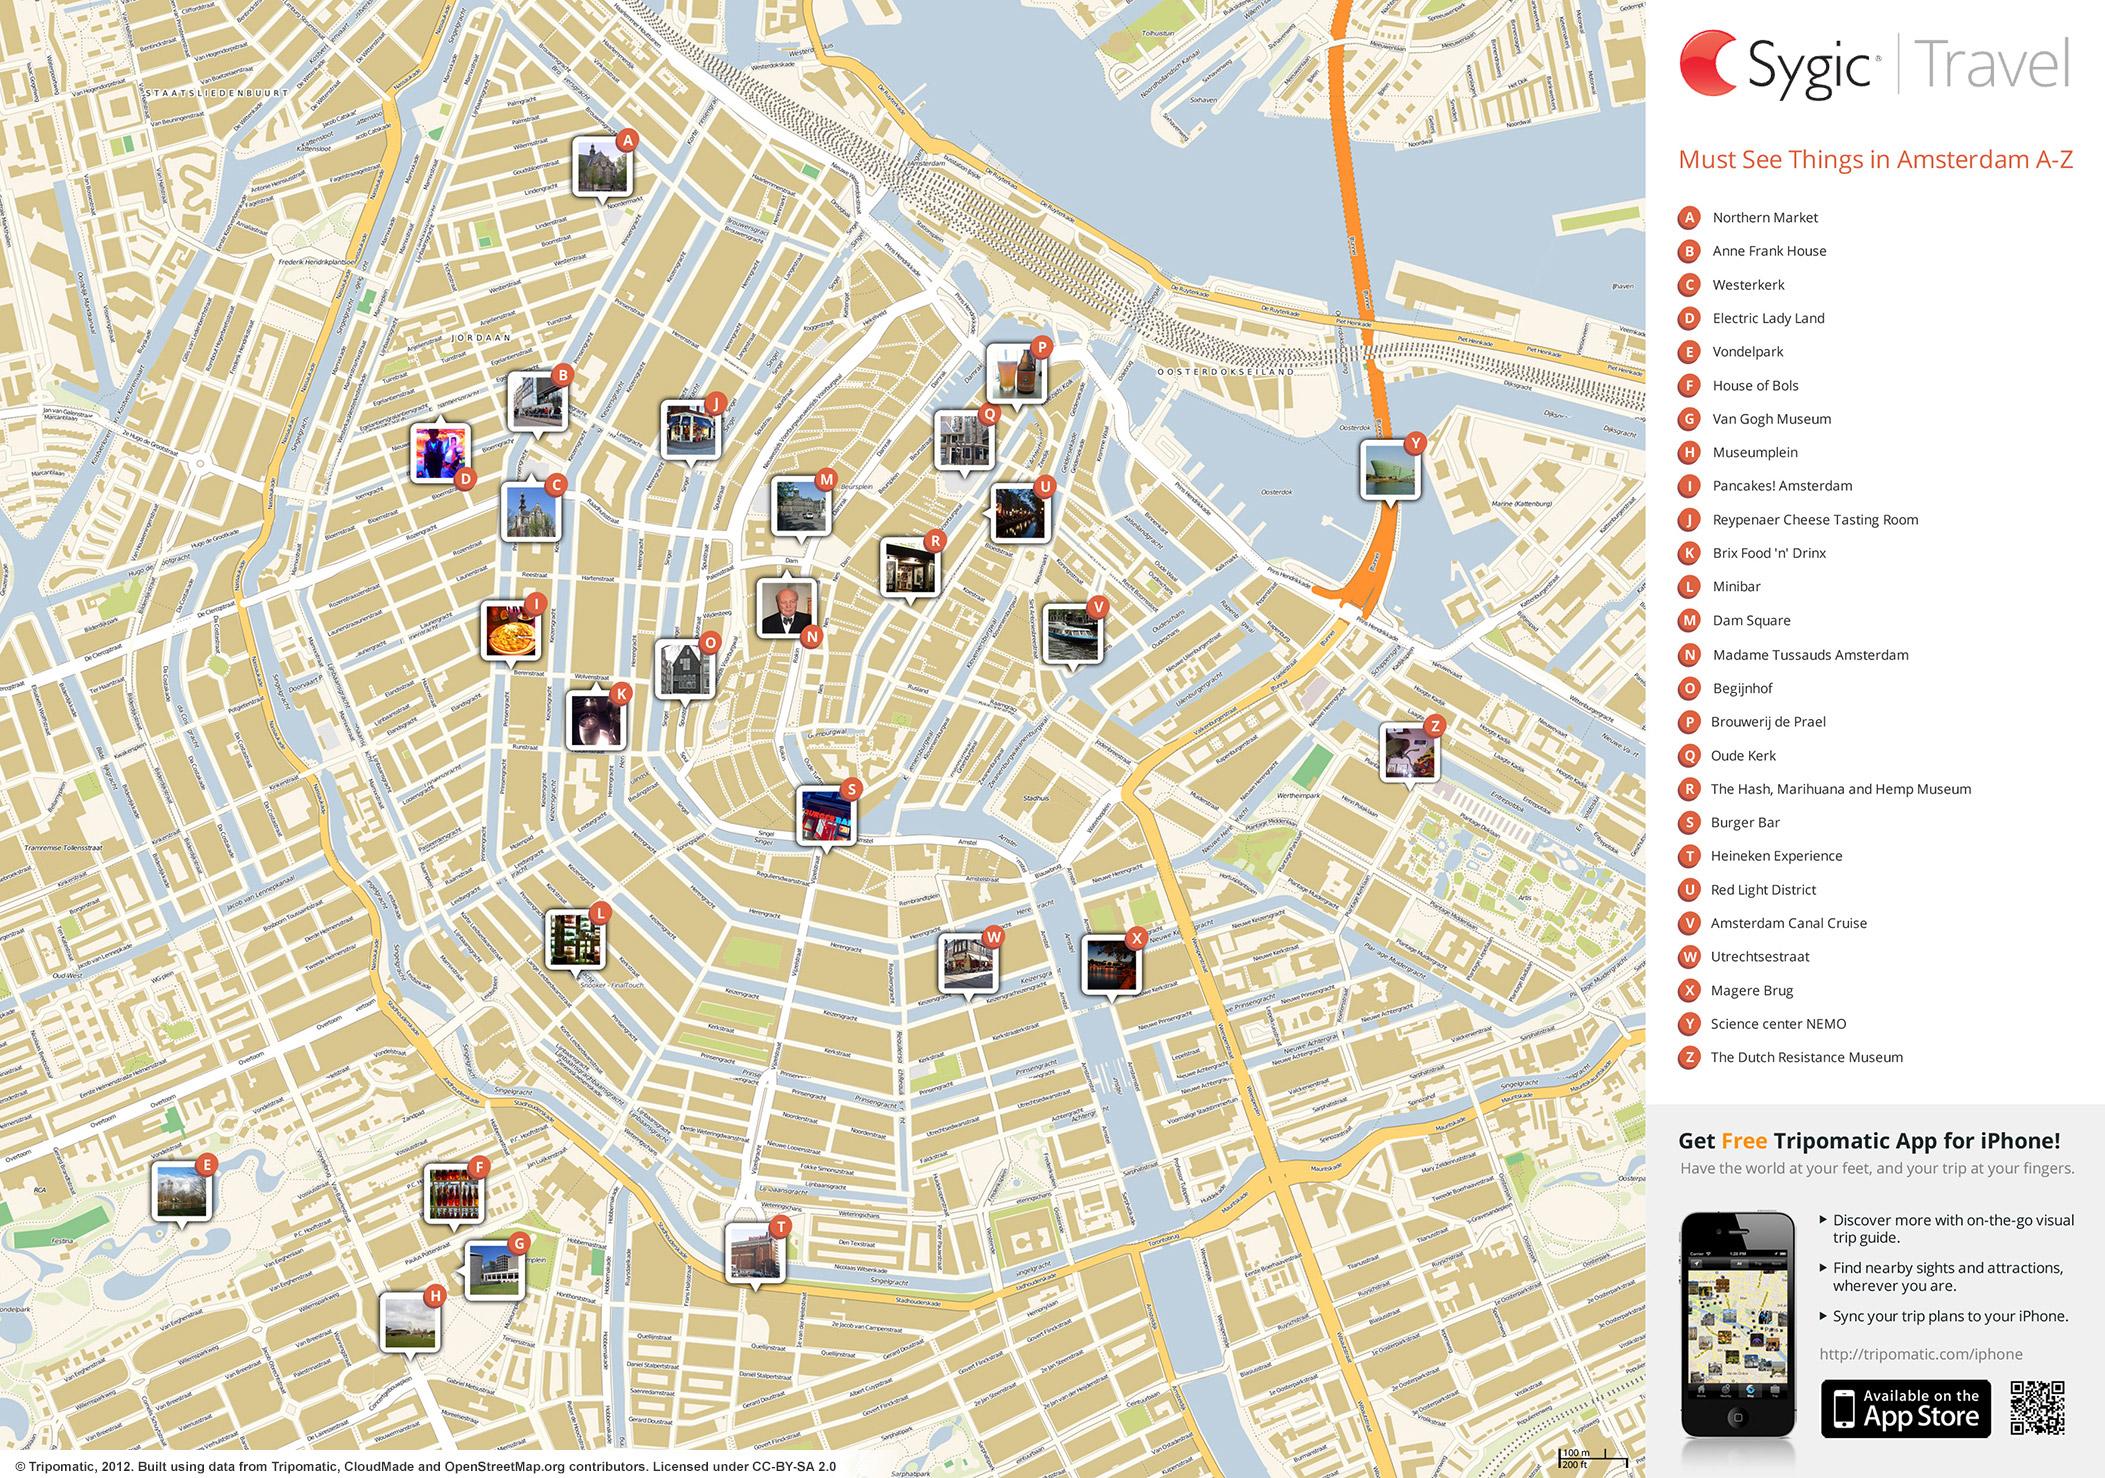 Tourist Map Of Amsterdam Amsterdam Printable Tourist Map | Sygic Travel Tourist Map Of Amsterdam